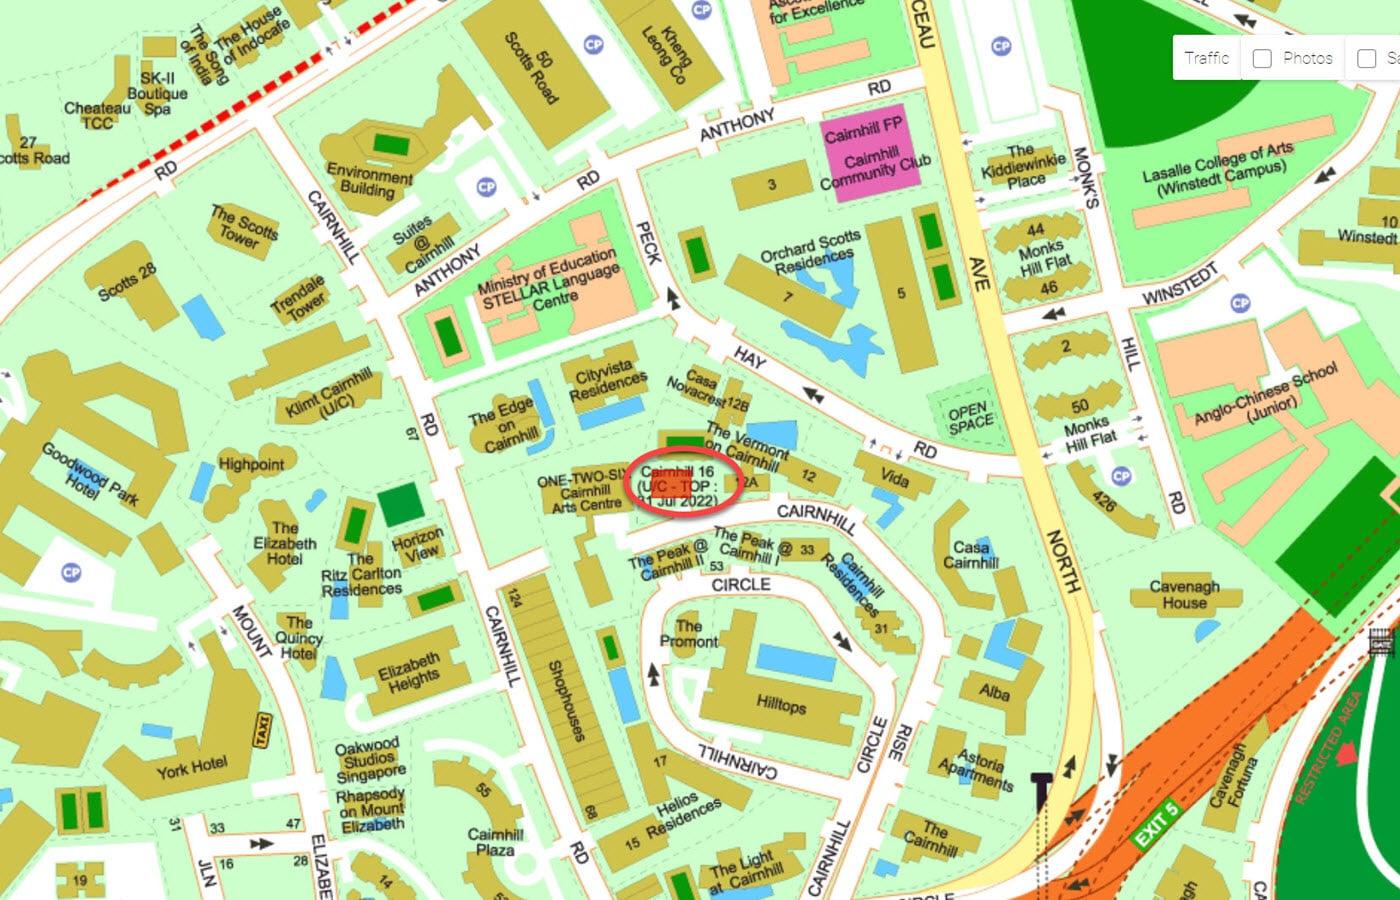 Cairnhill 16 - Street Directory Map